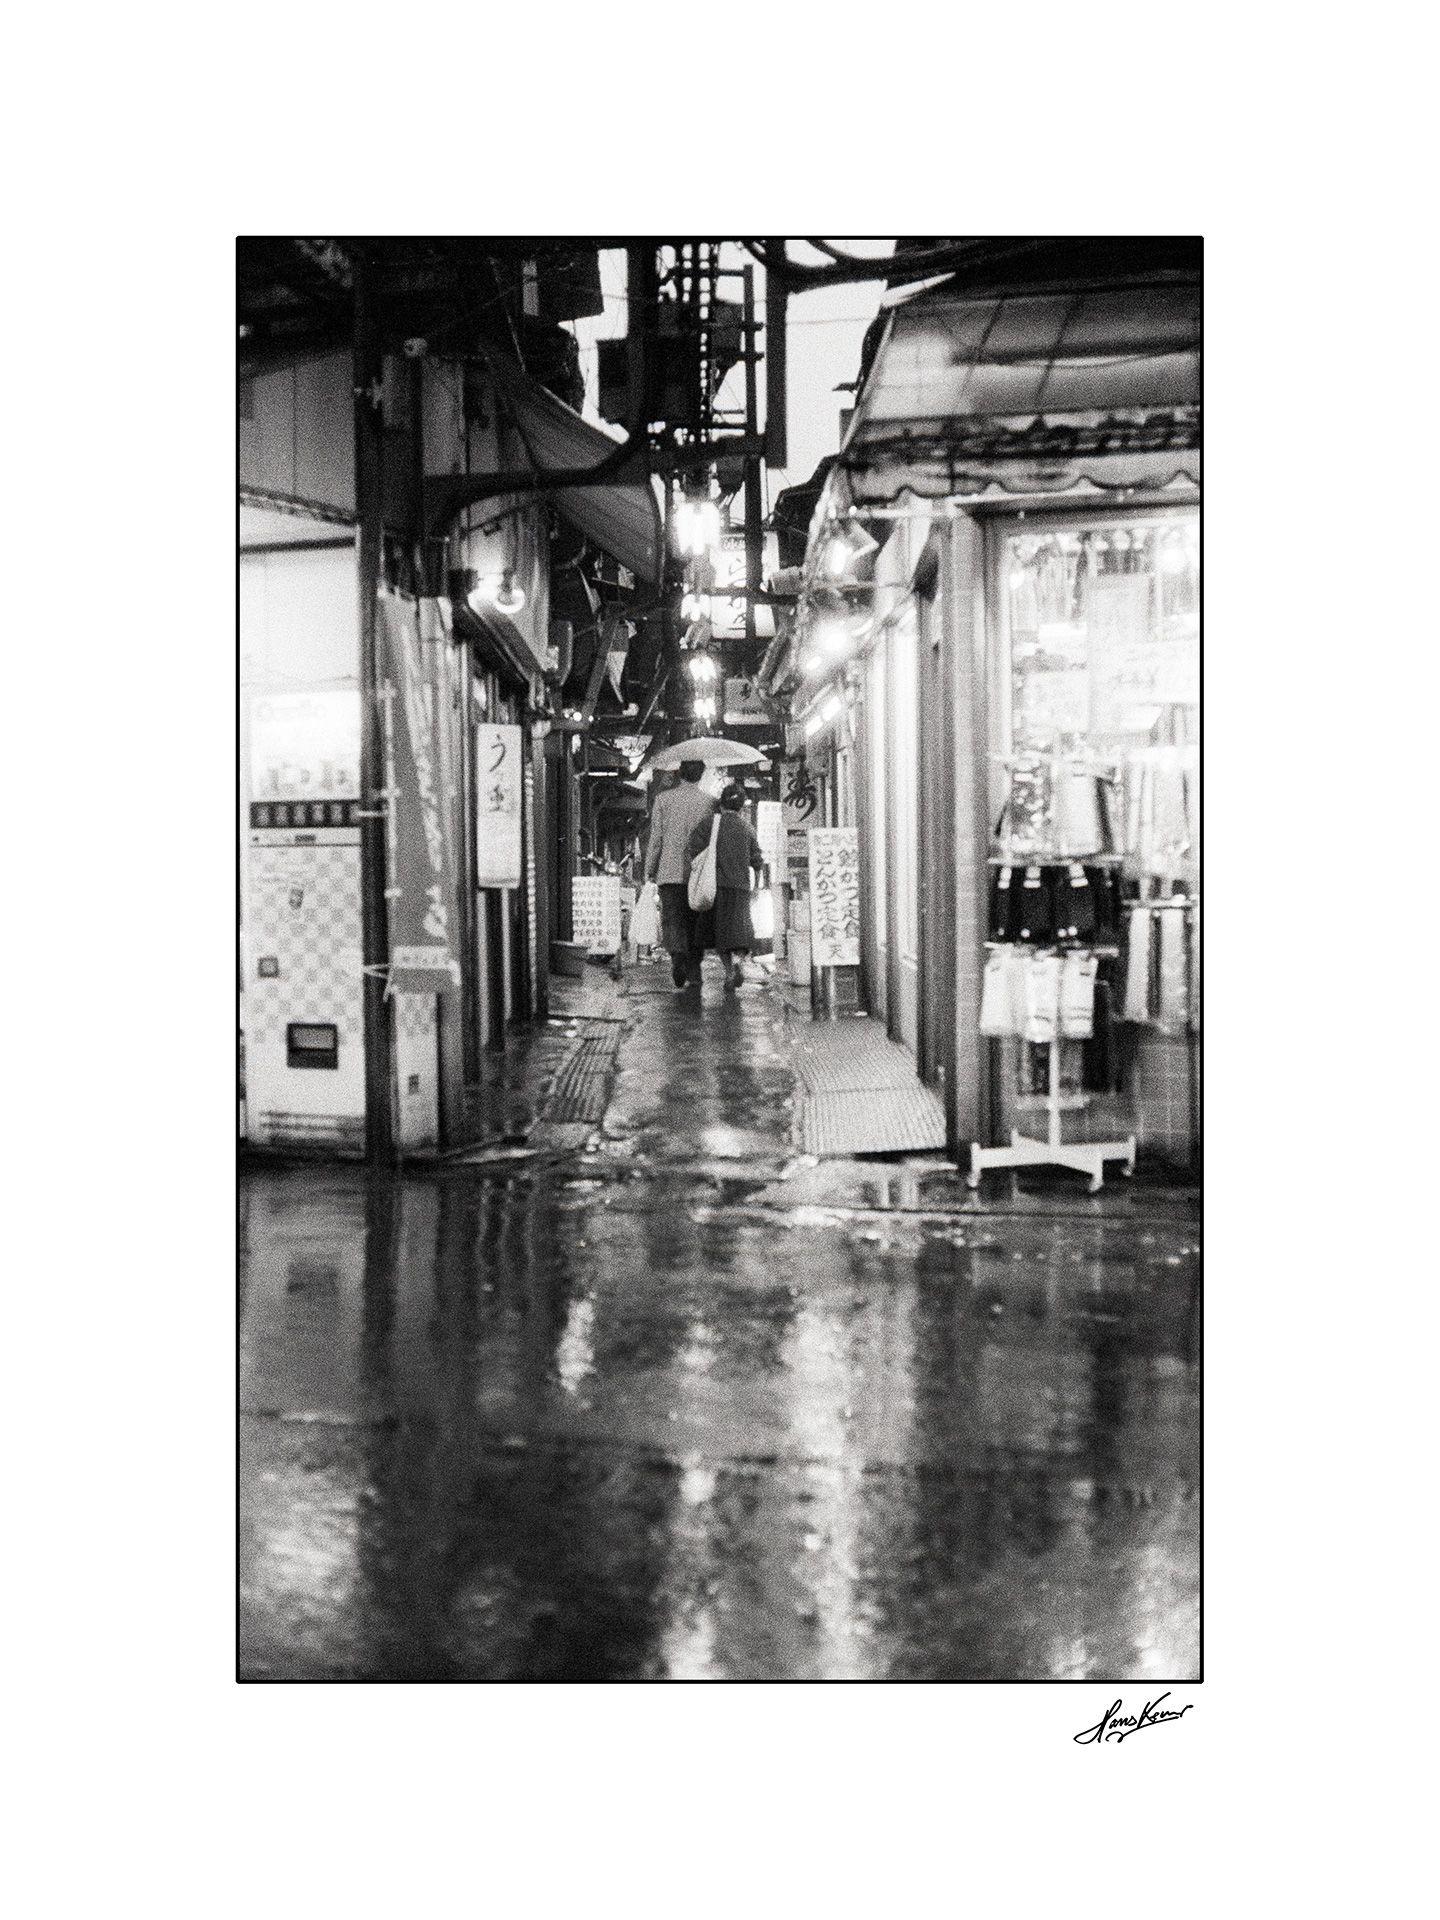 Shinjuku alley, Tokyo, Japan, 1986